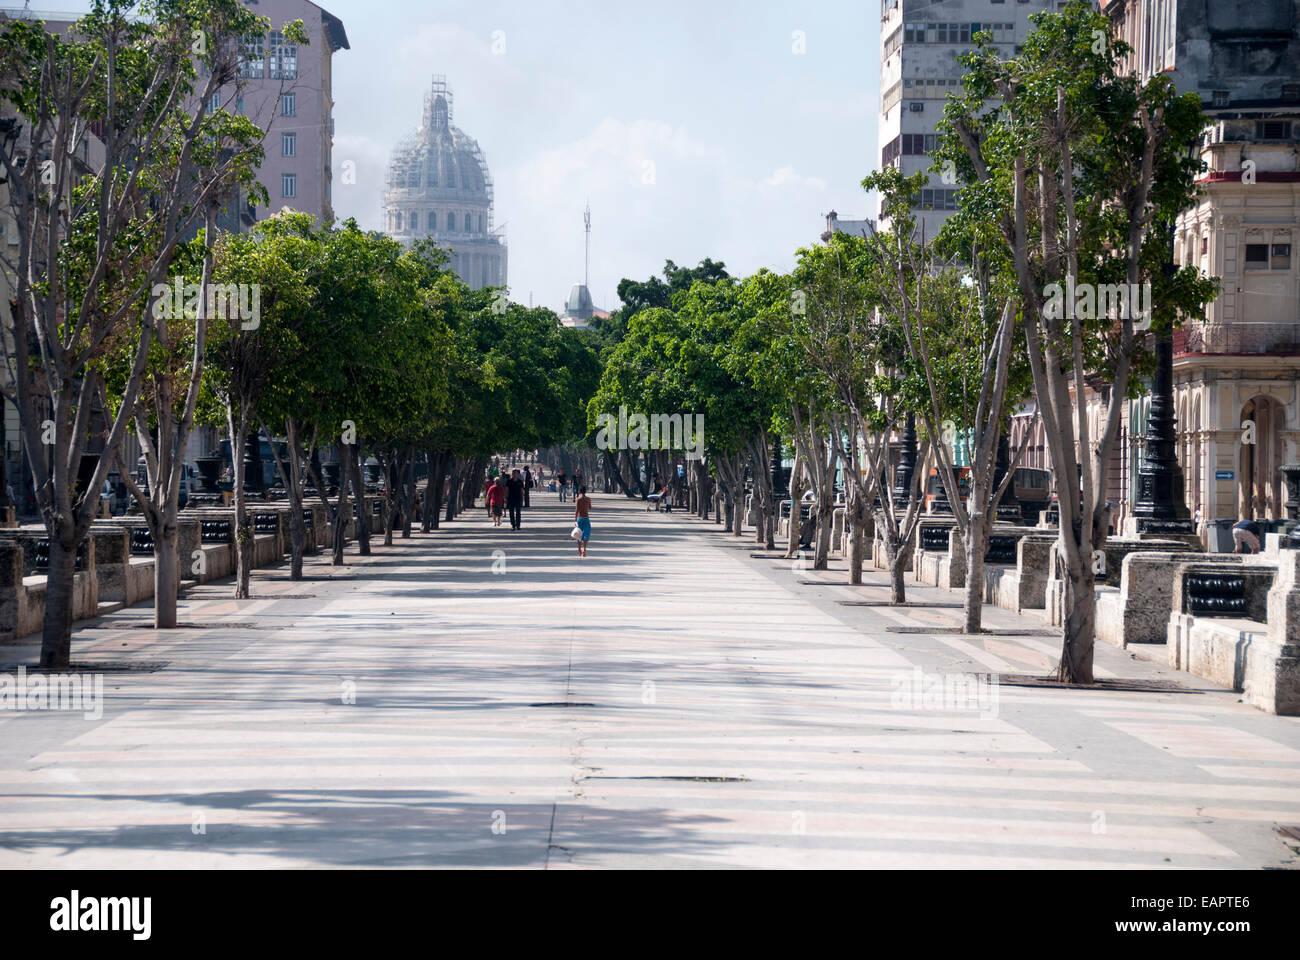 paseo-del-prado-is-a-pedestrian-promenade-that-divides-the-center-EAPTE6.jpg